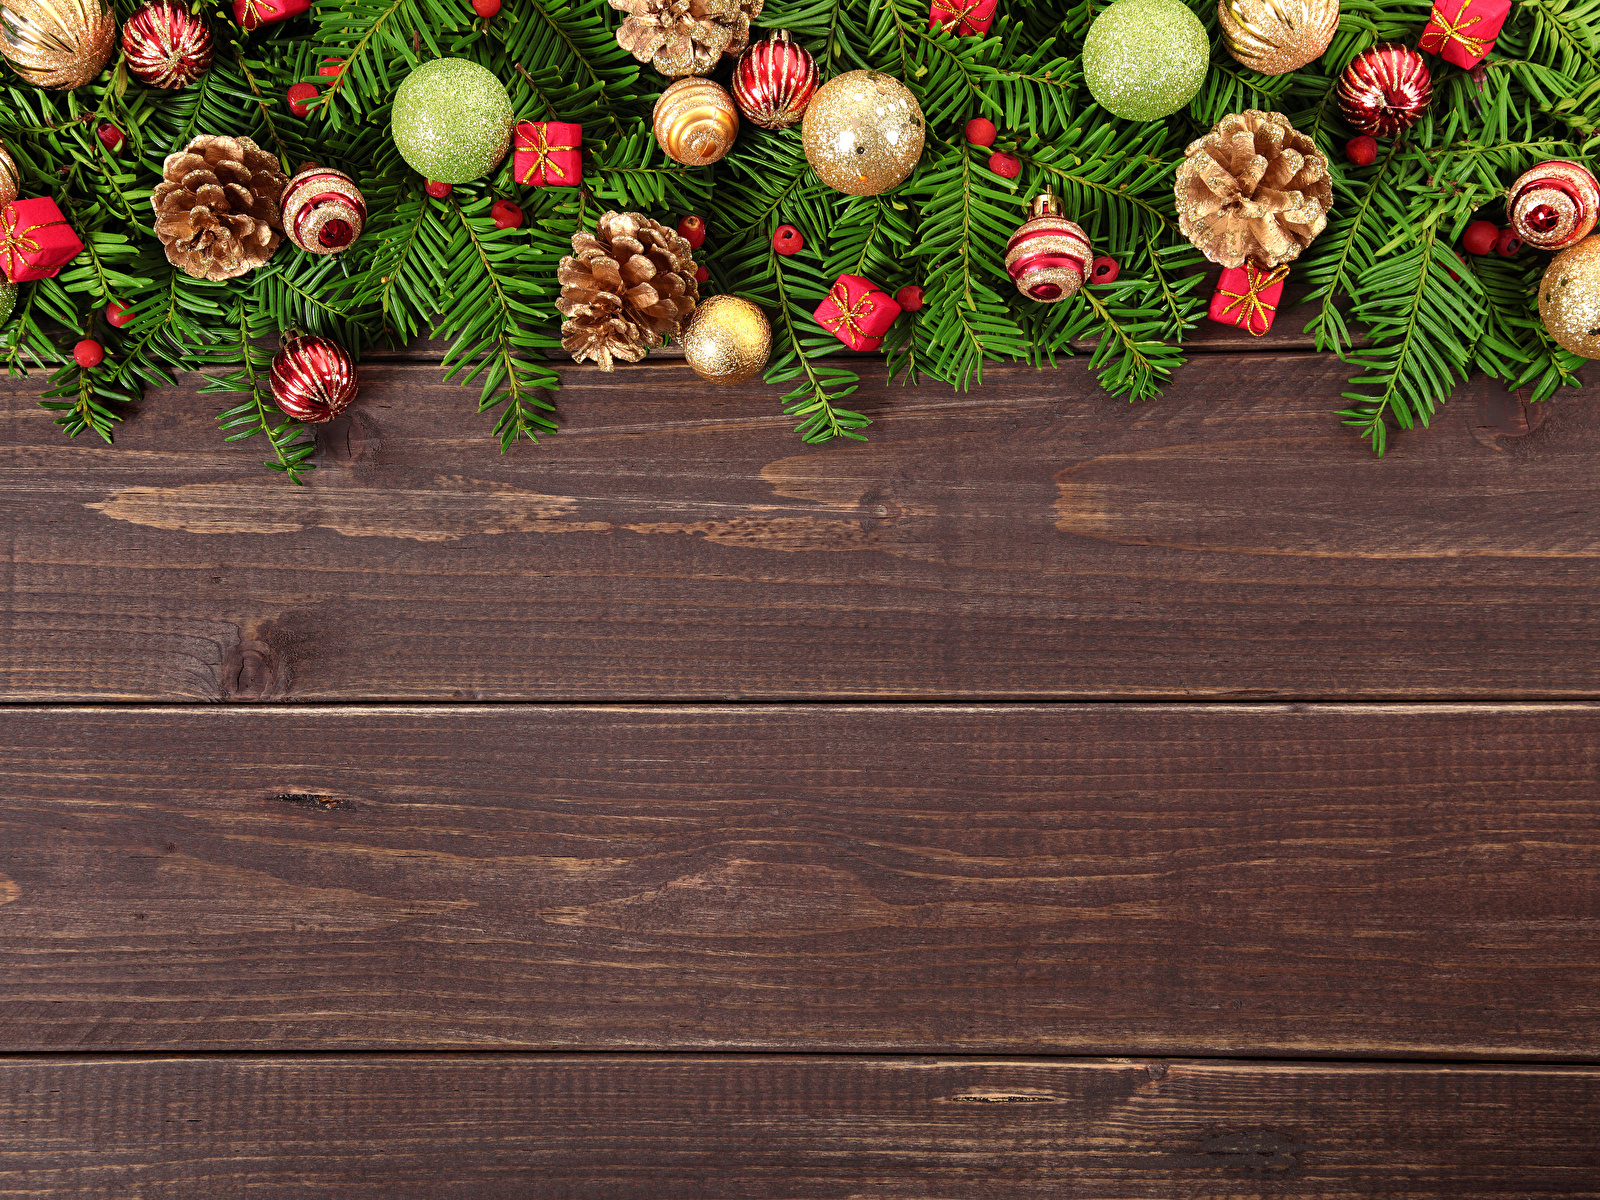 Картинка Рождество Шар шишка Доски 1600x1200 Новый год Шишки Шарики